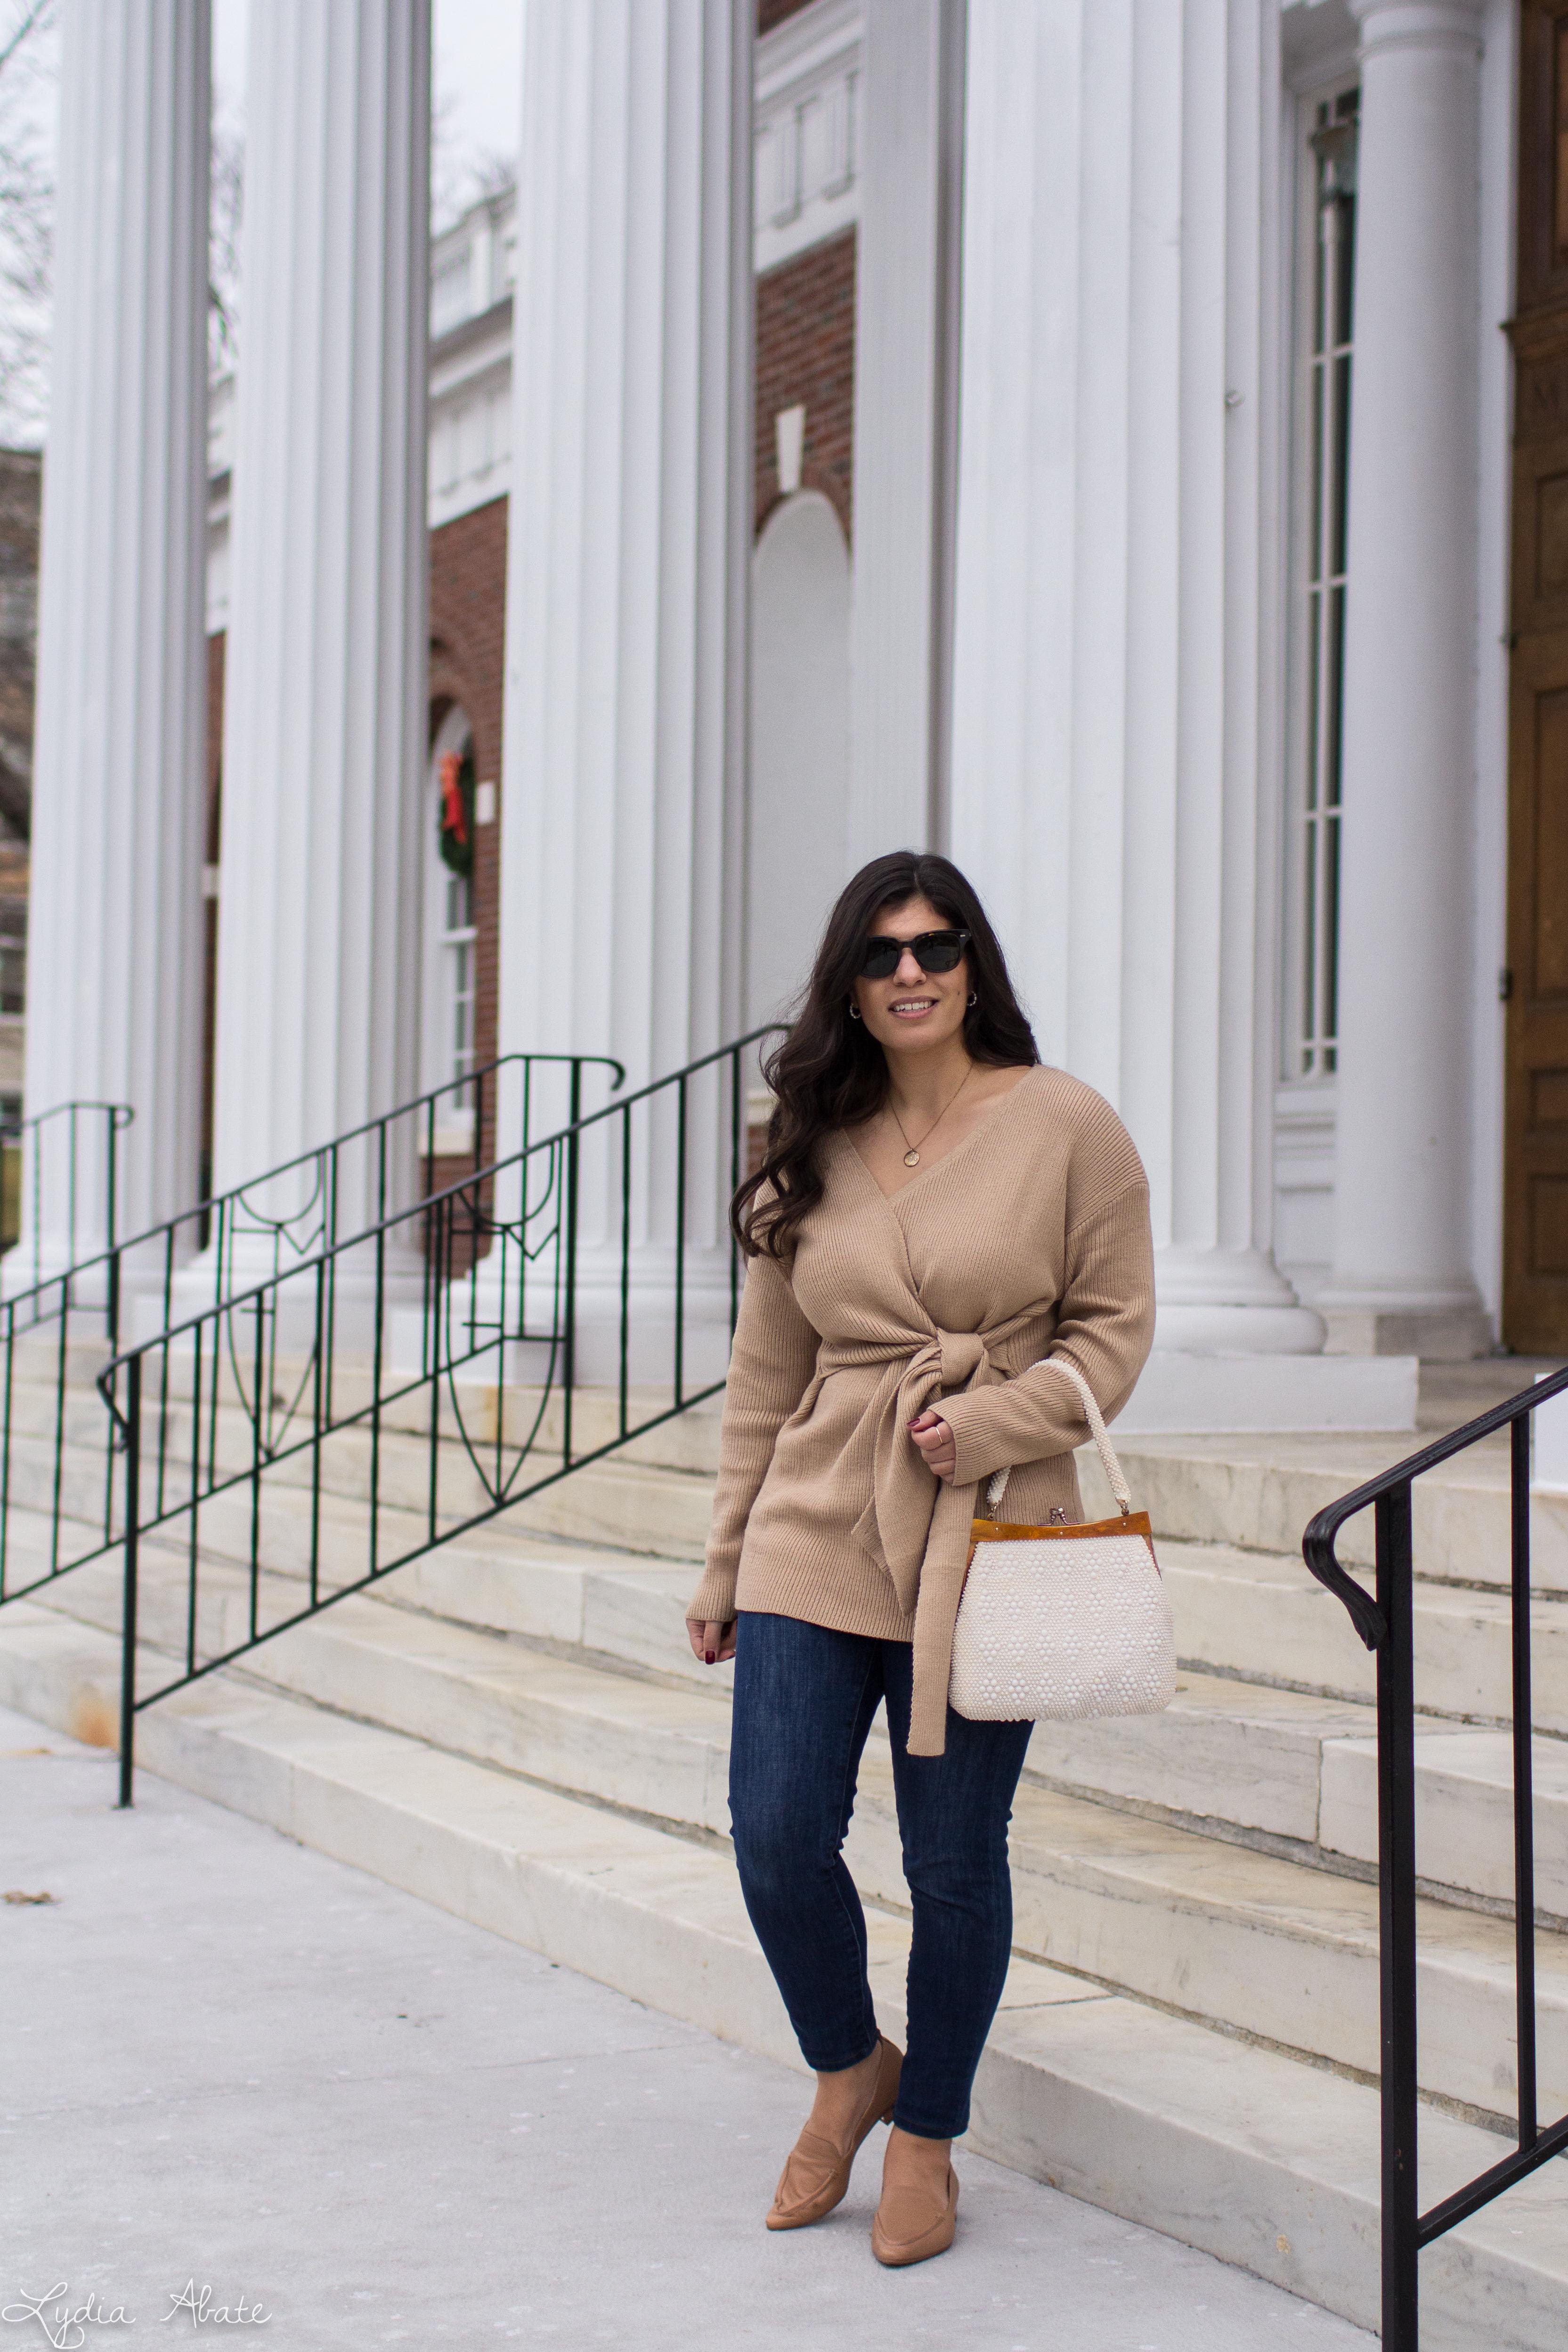 camel wrap sweater, jeans, tan loafers, vintage beaded bag-5.jpg